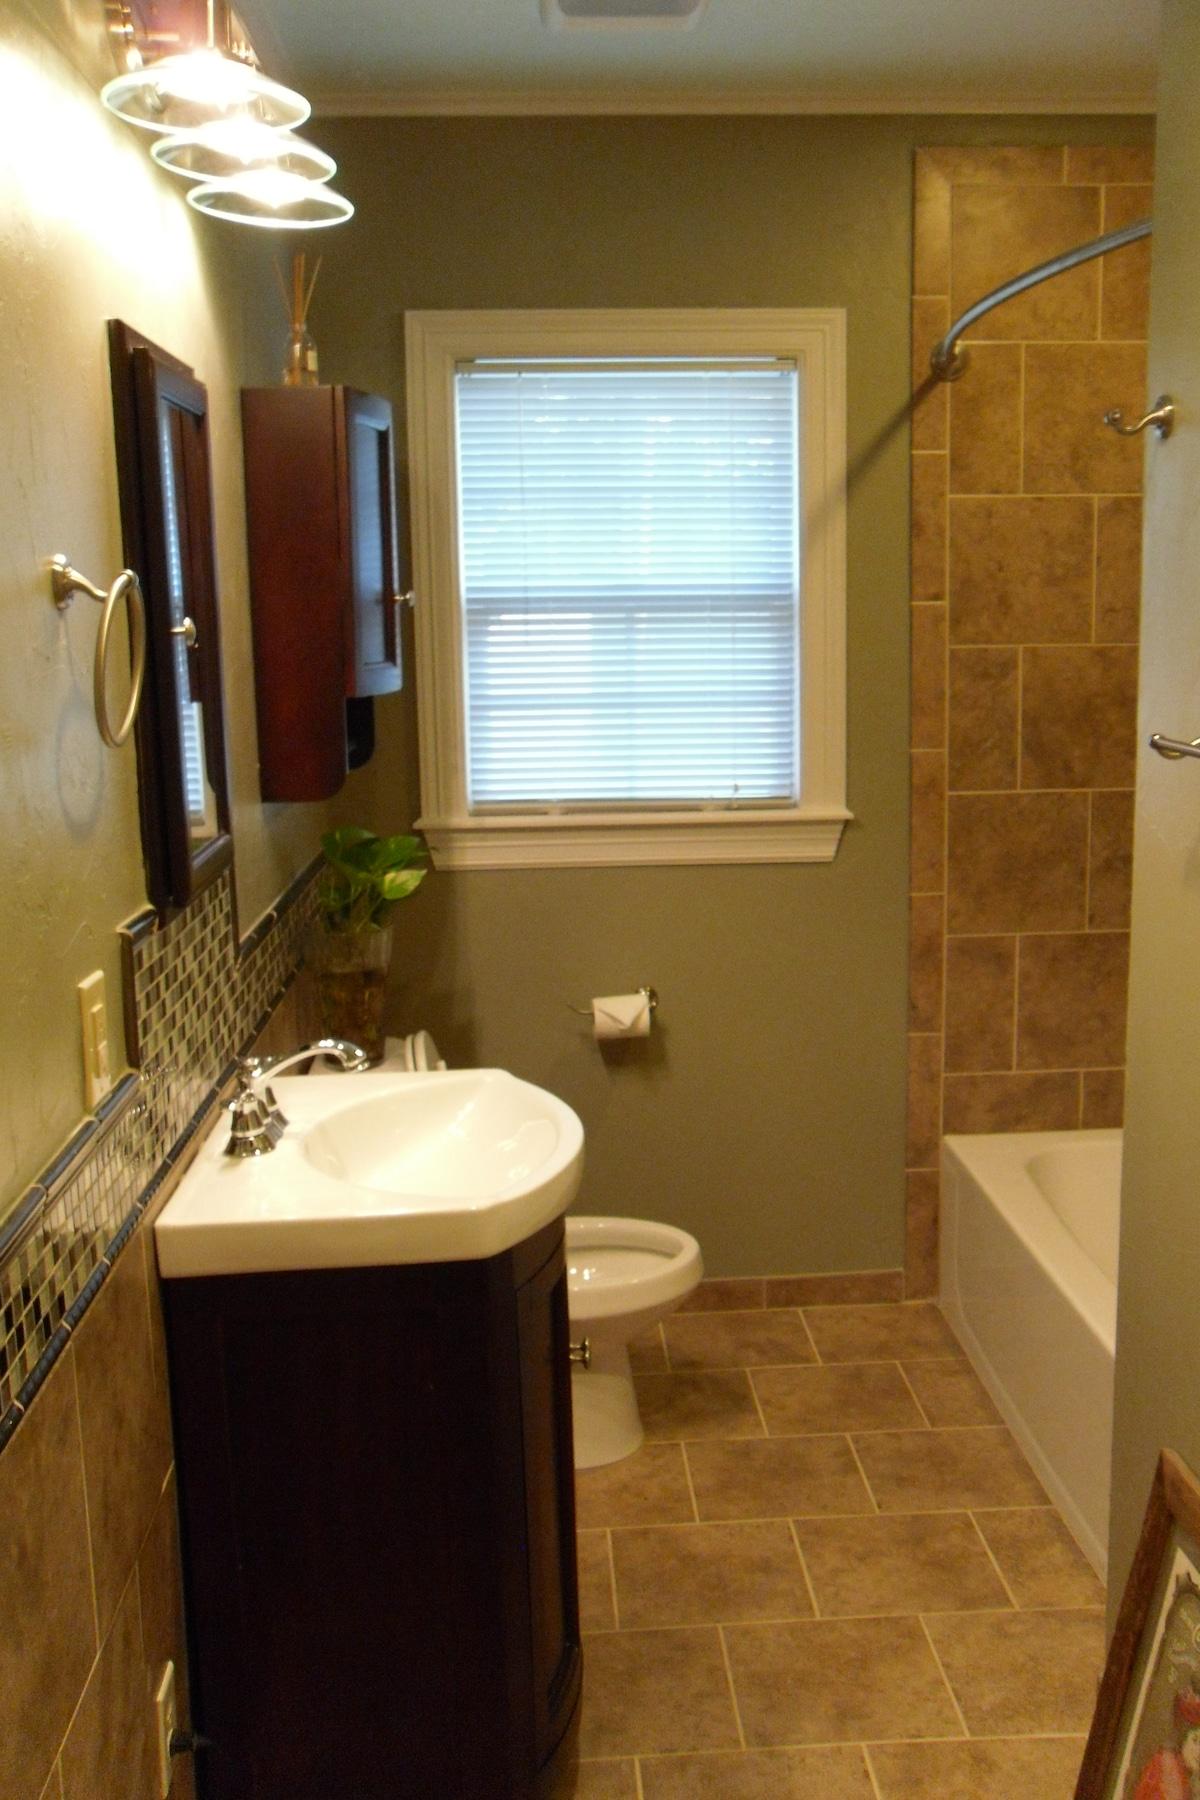 Clean accessible bathroom.